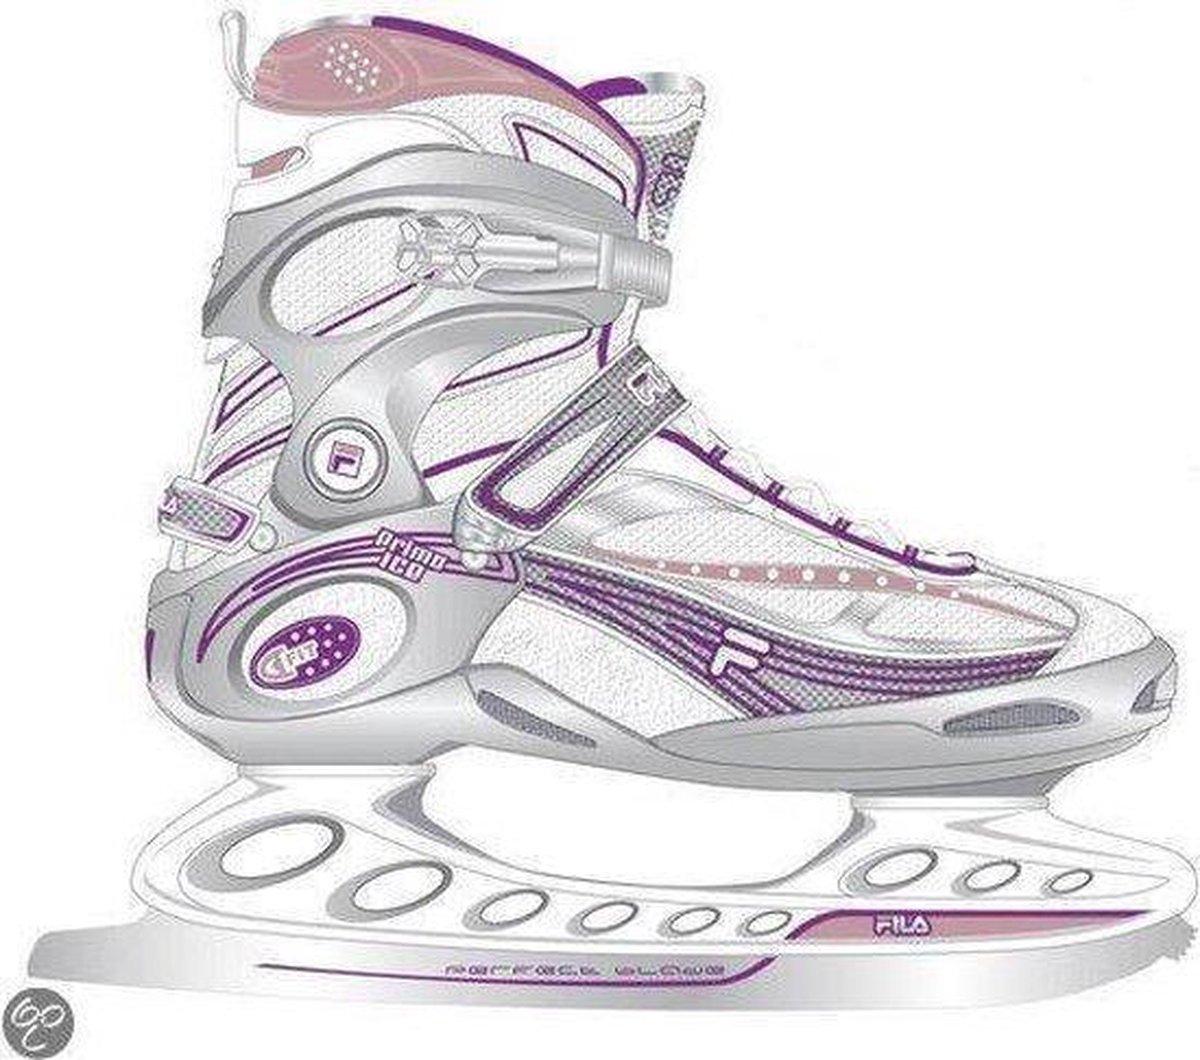 Fila - Primo Ice VL Lady - Ijshockeyschaats- Schaats - Dames - Maat 42